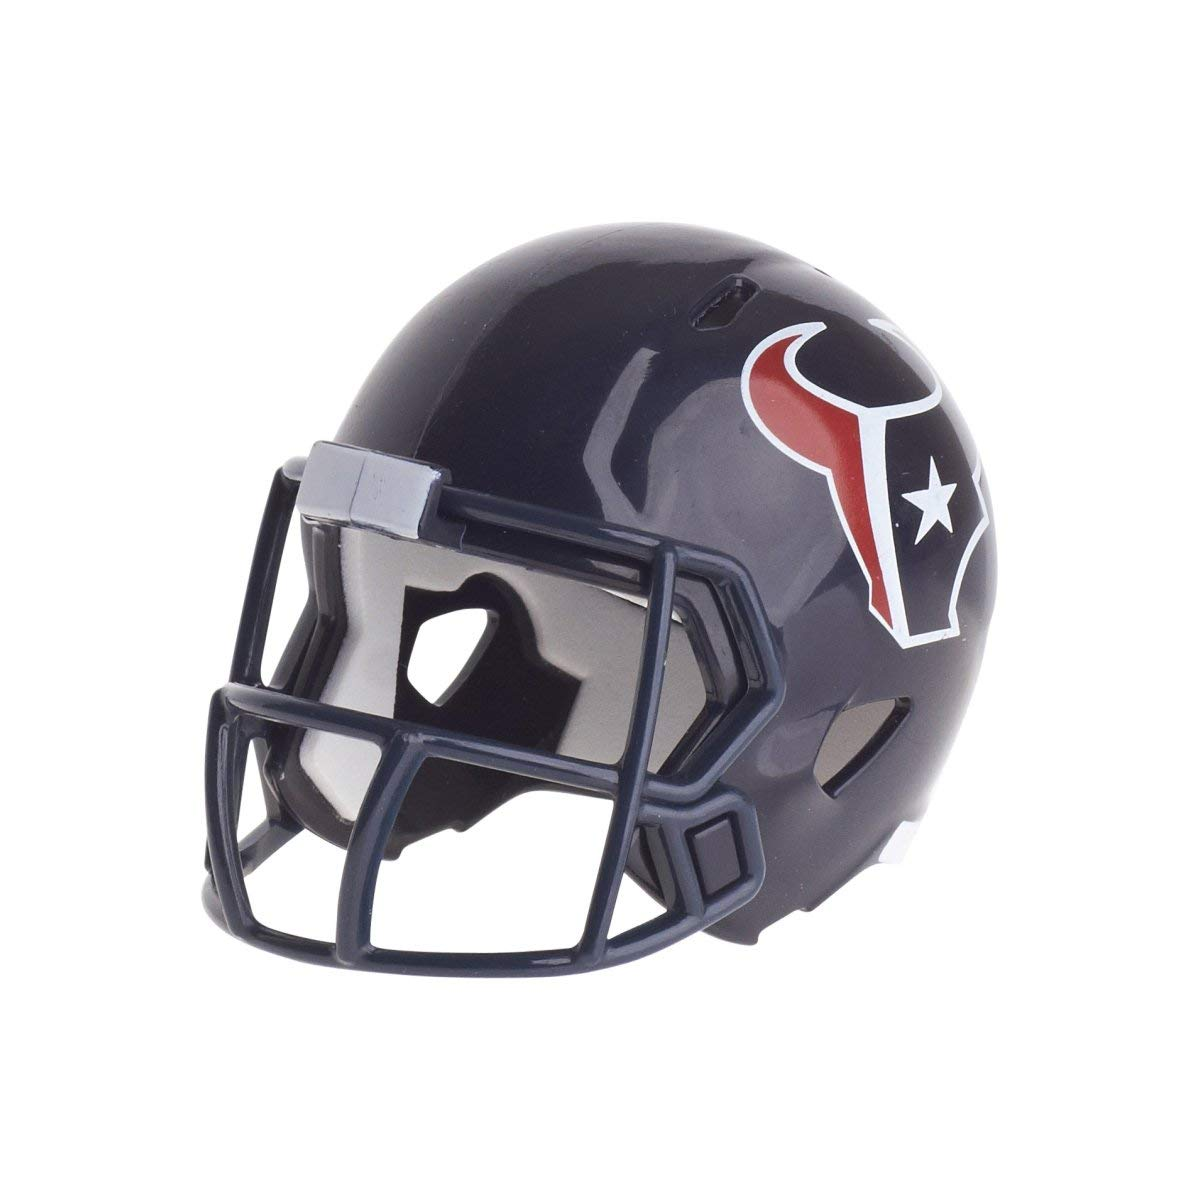 Riddell Houston Texans Originalnachbildung Speed Micro/Kamerahandys/Mini Football Helm 095855320595